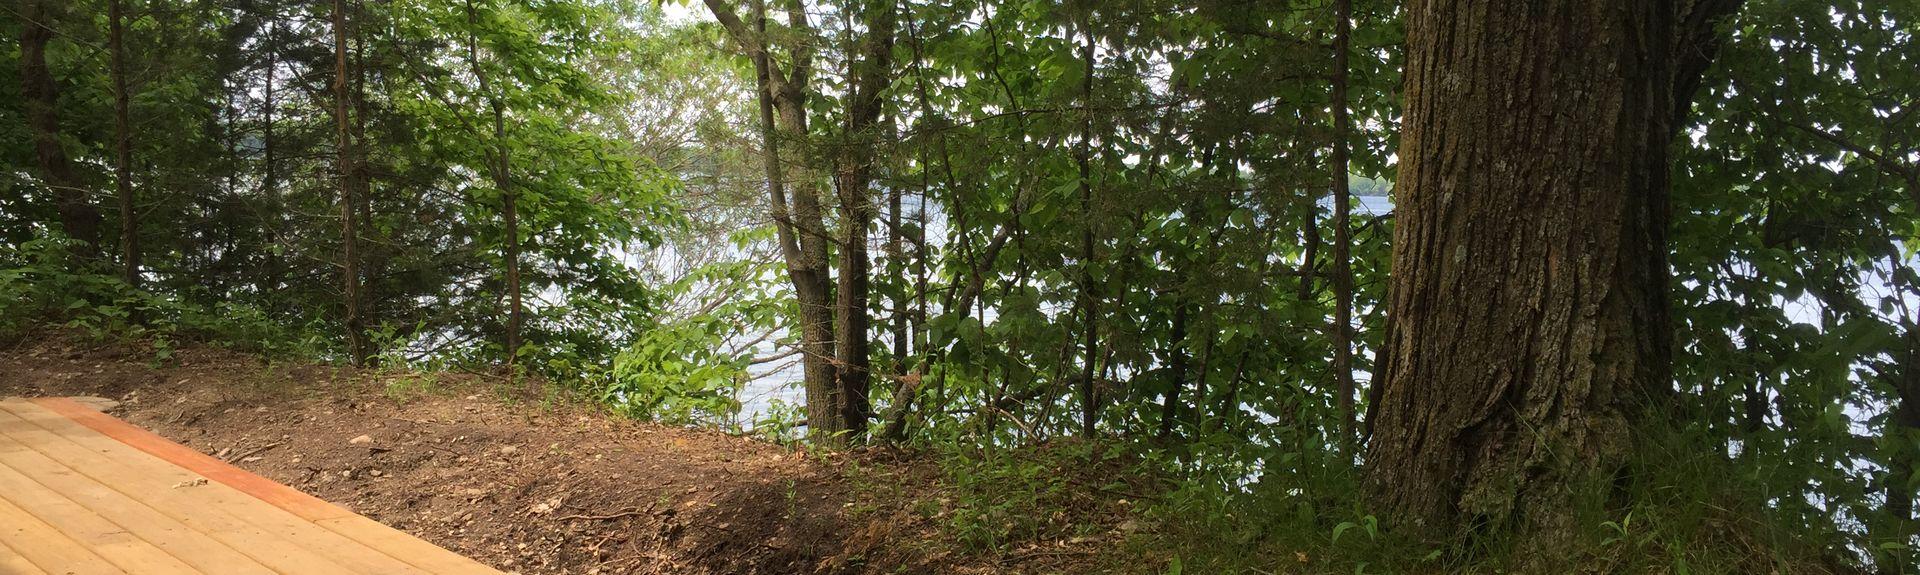 Maple Lake, MN, USA